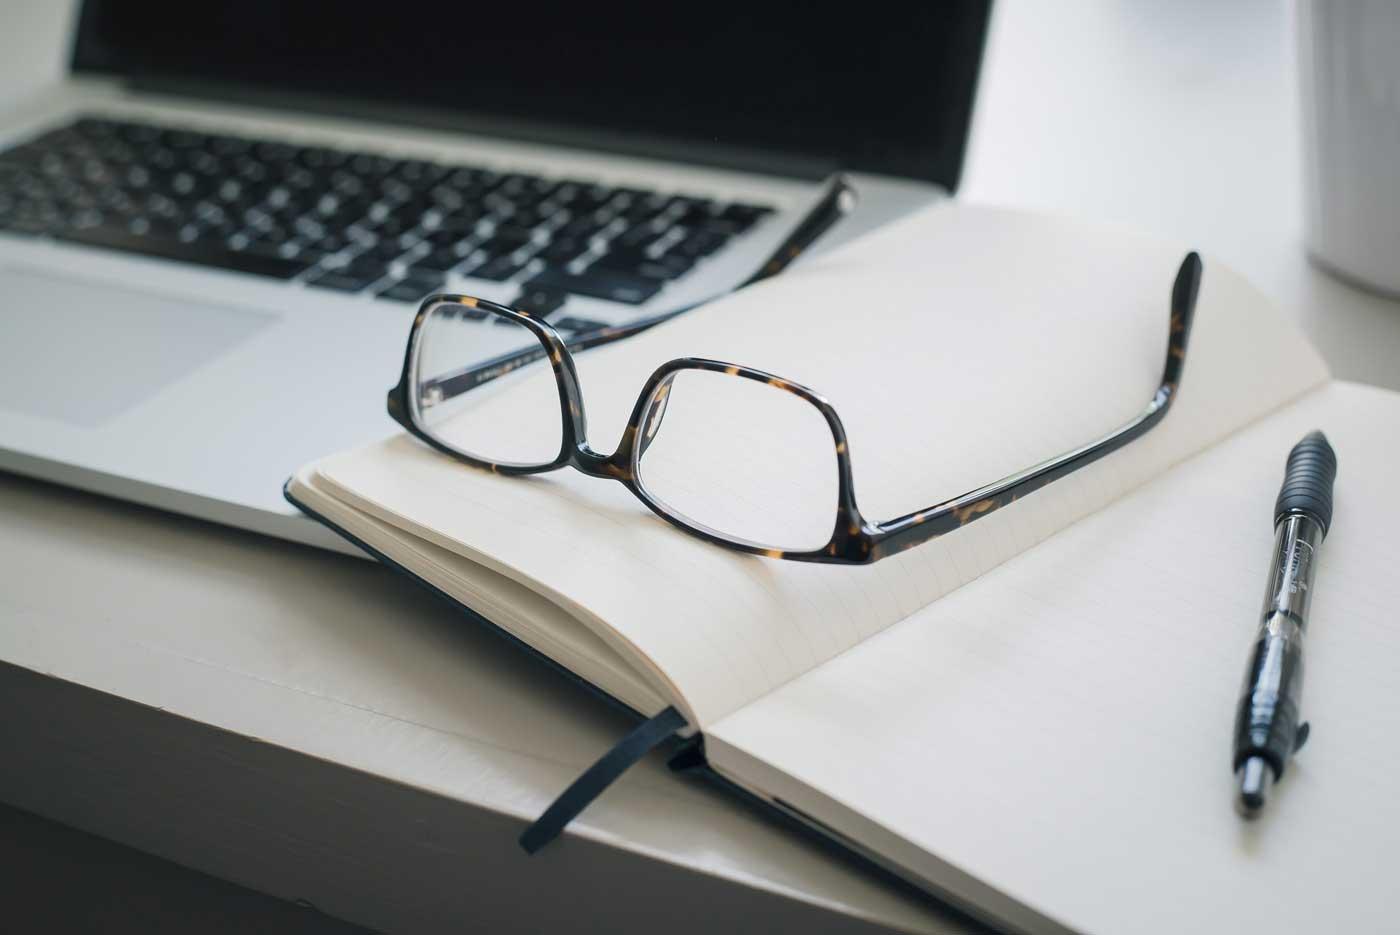 laptop, glasses, notebook